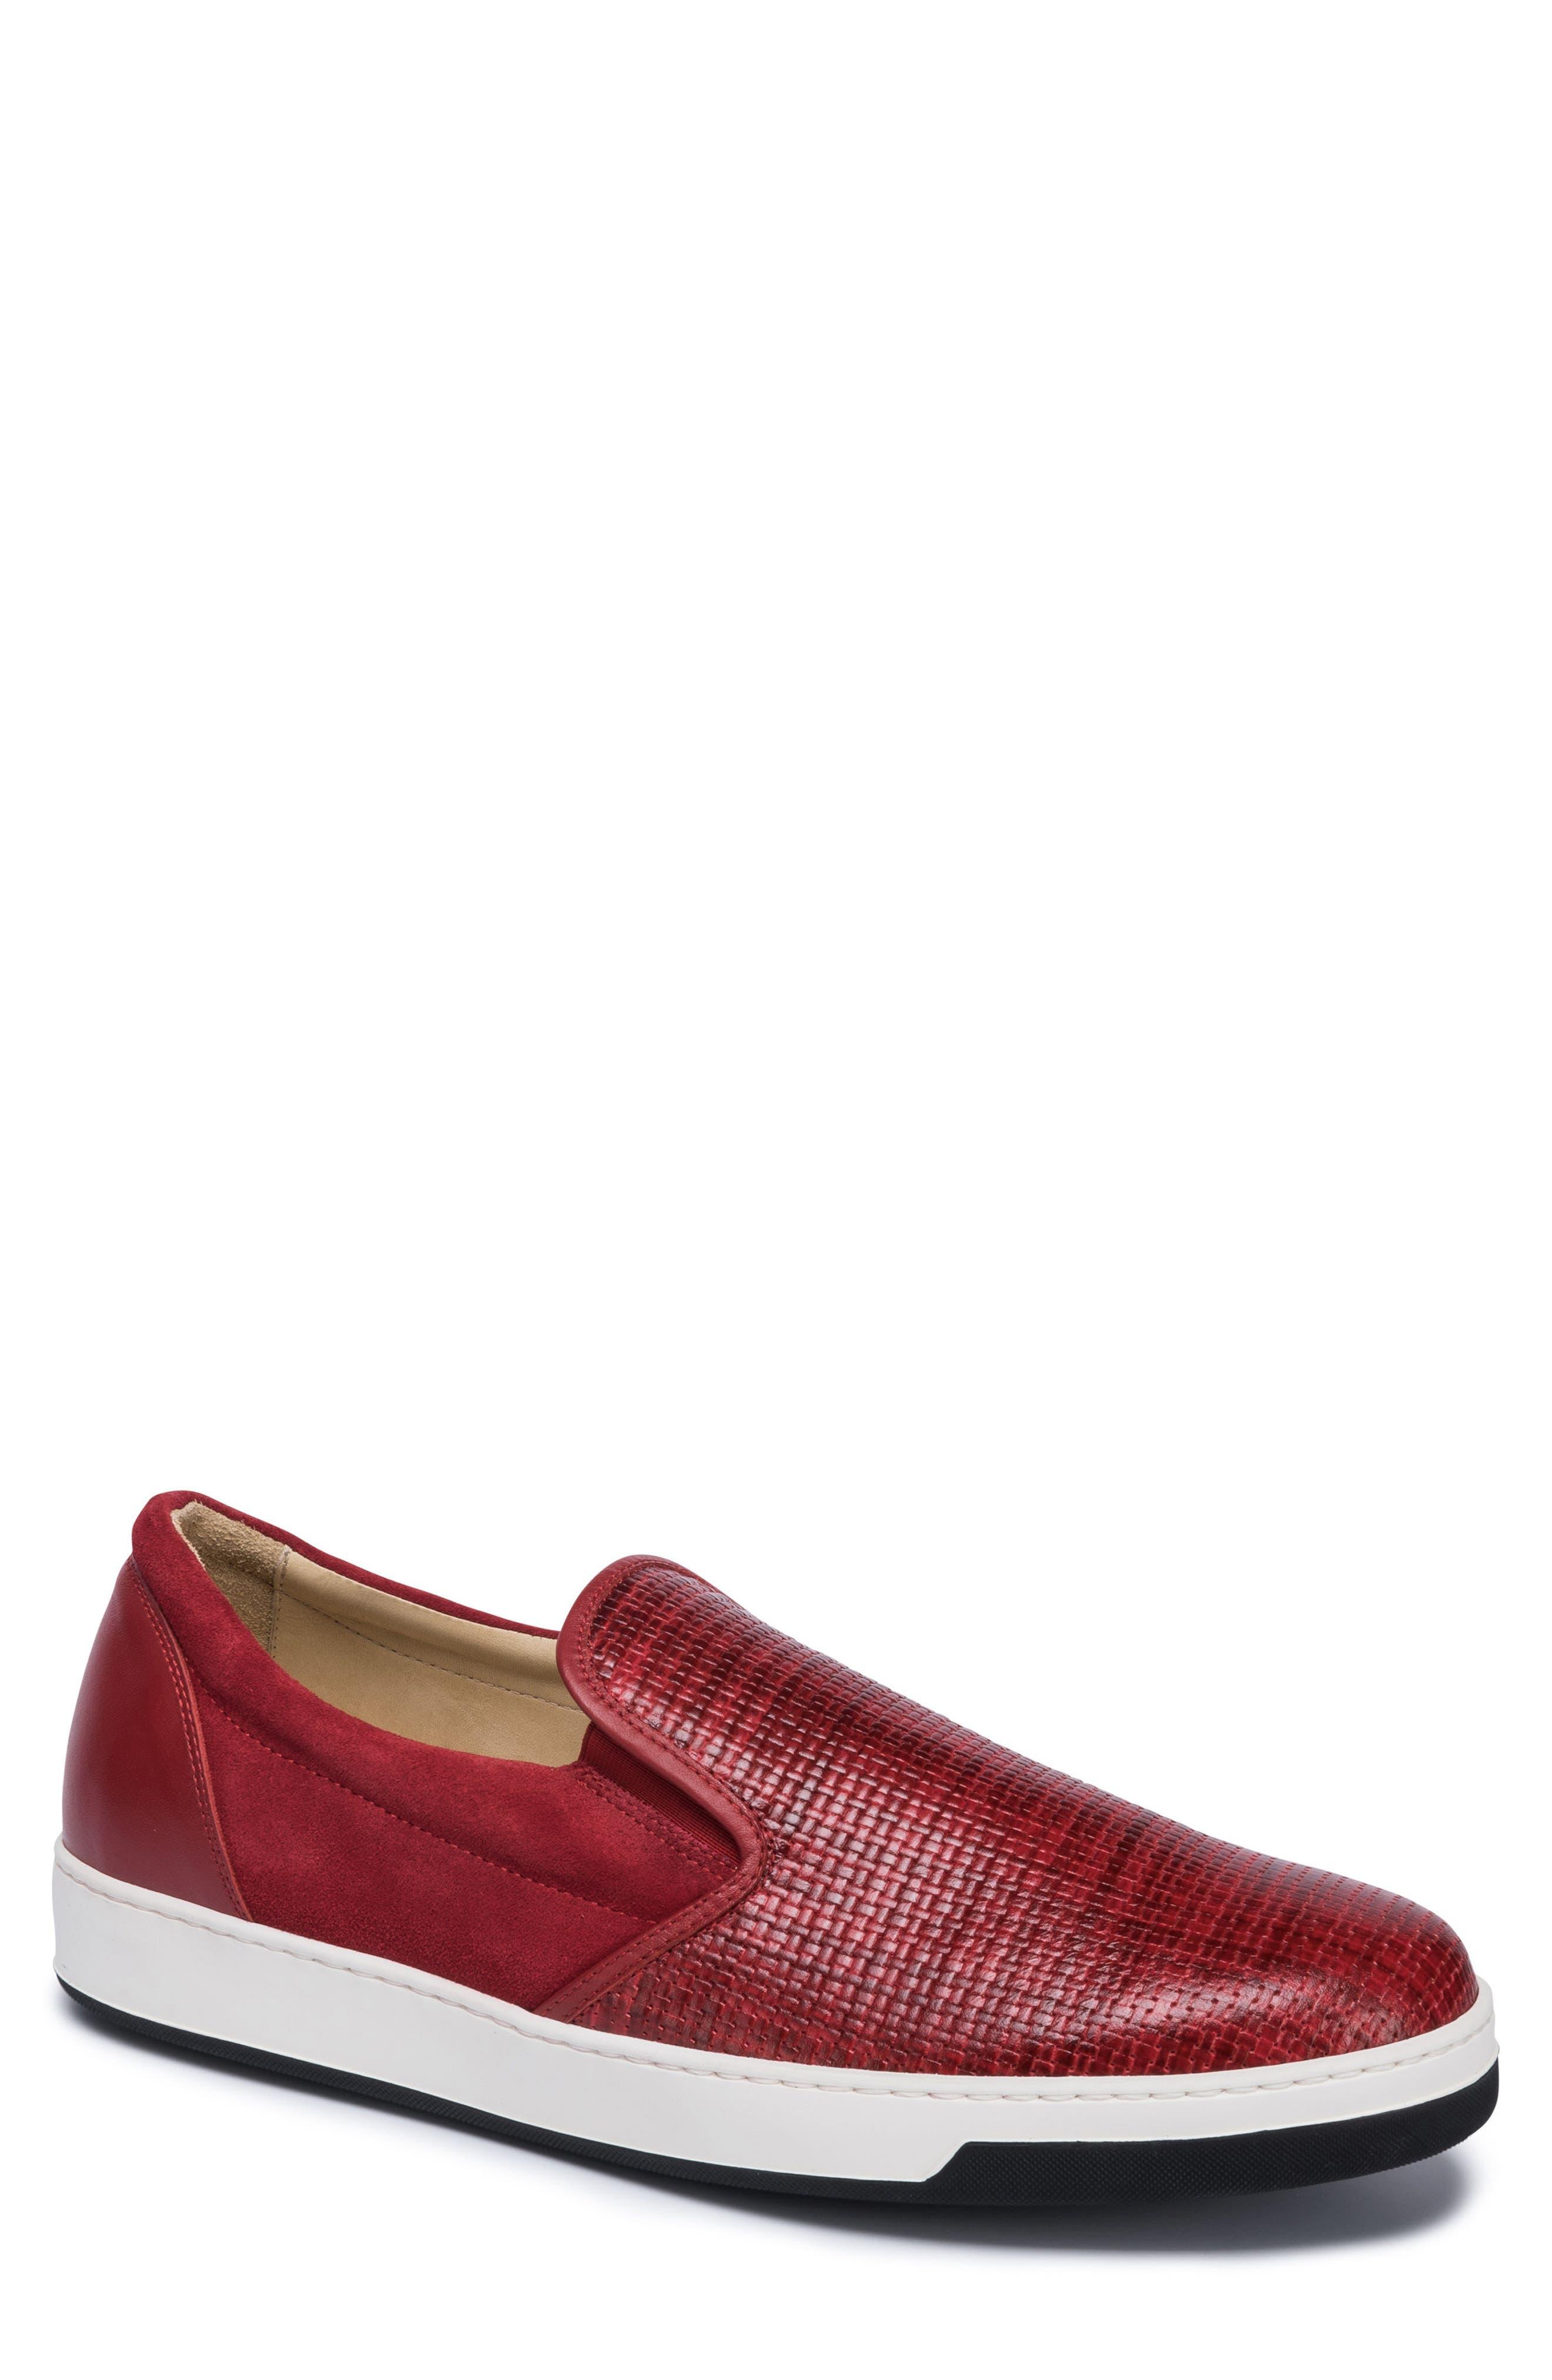 Cinque Terre Woven Slip-On Sneaker,                             Main thumbnail 3, color,